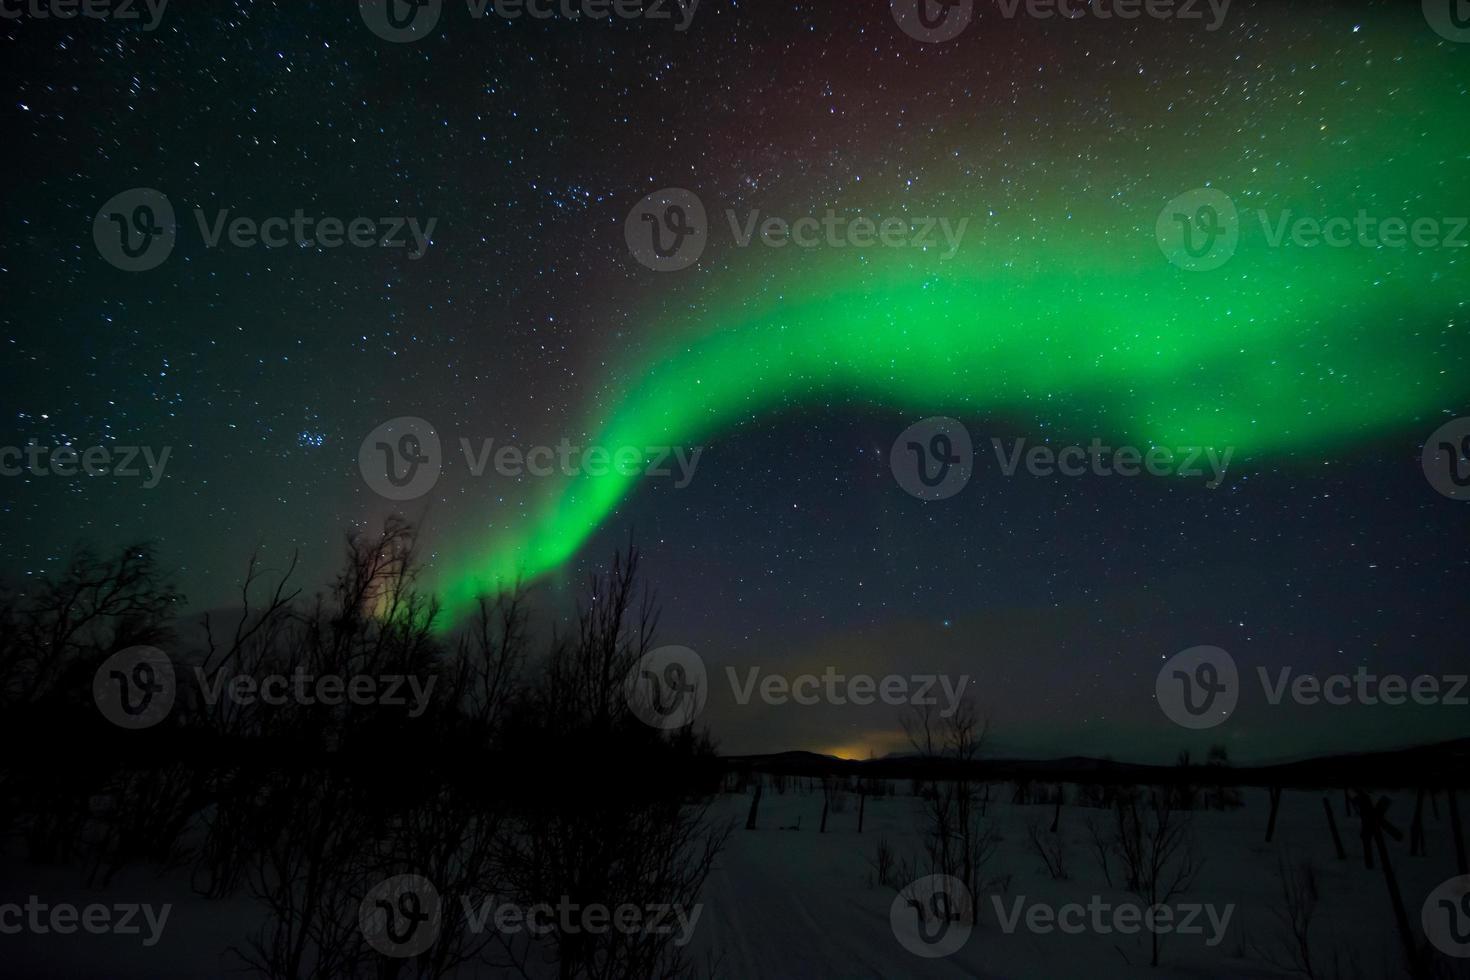 pleiades, hyades, aldebaran & aurora borealis ver 3 foto